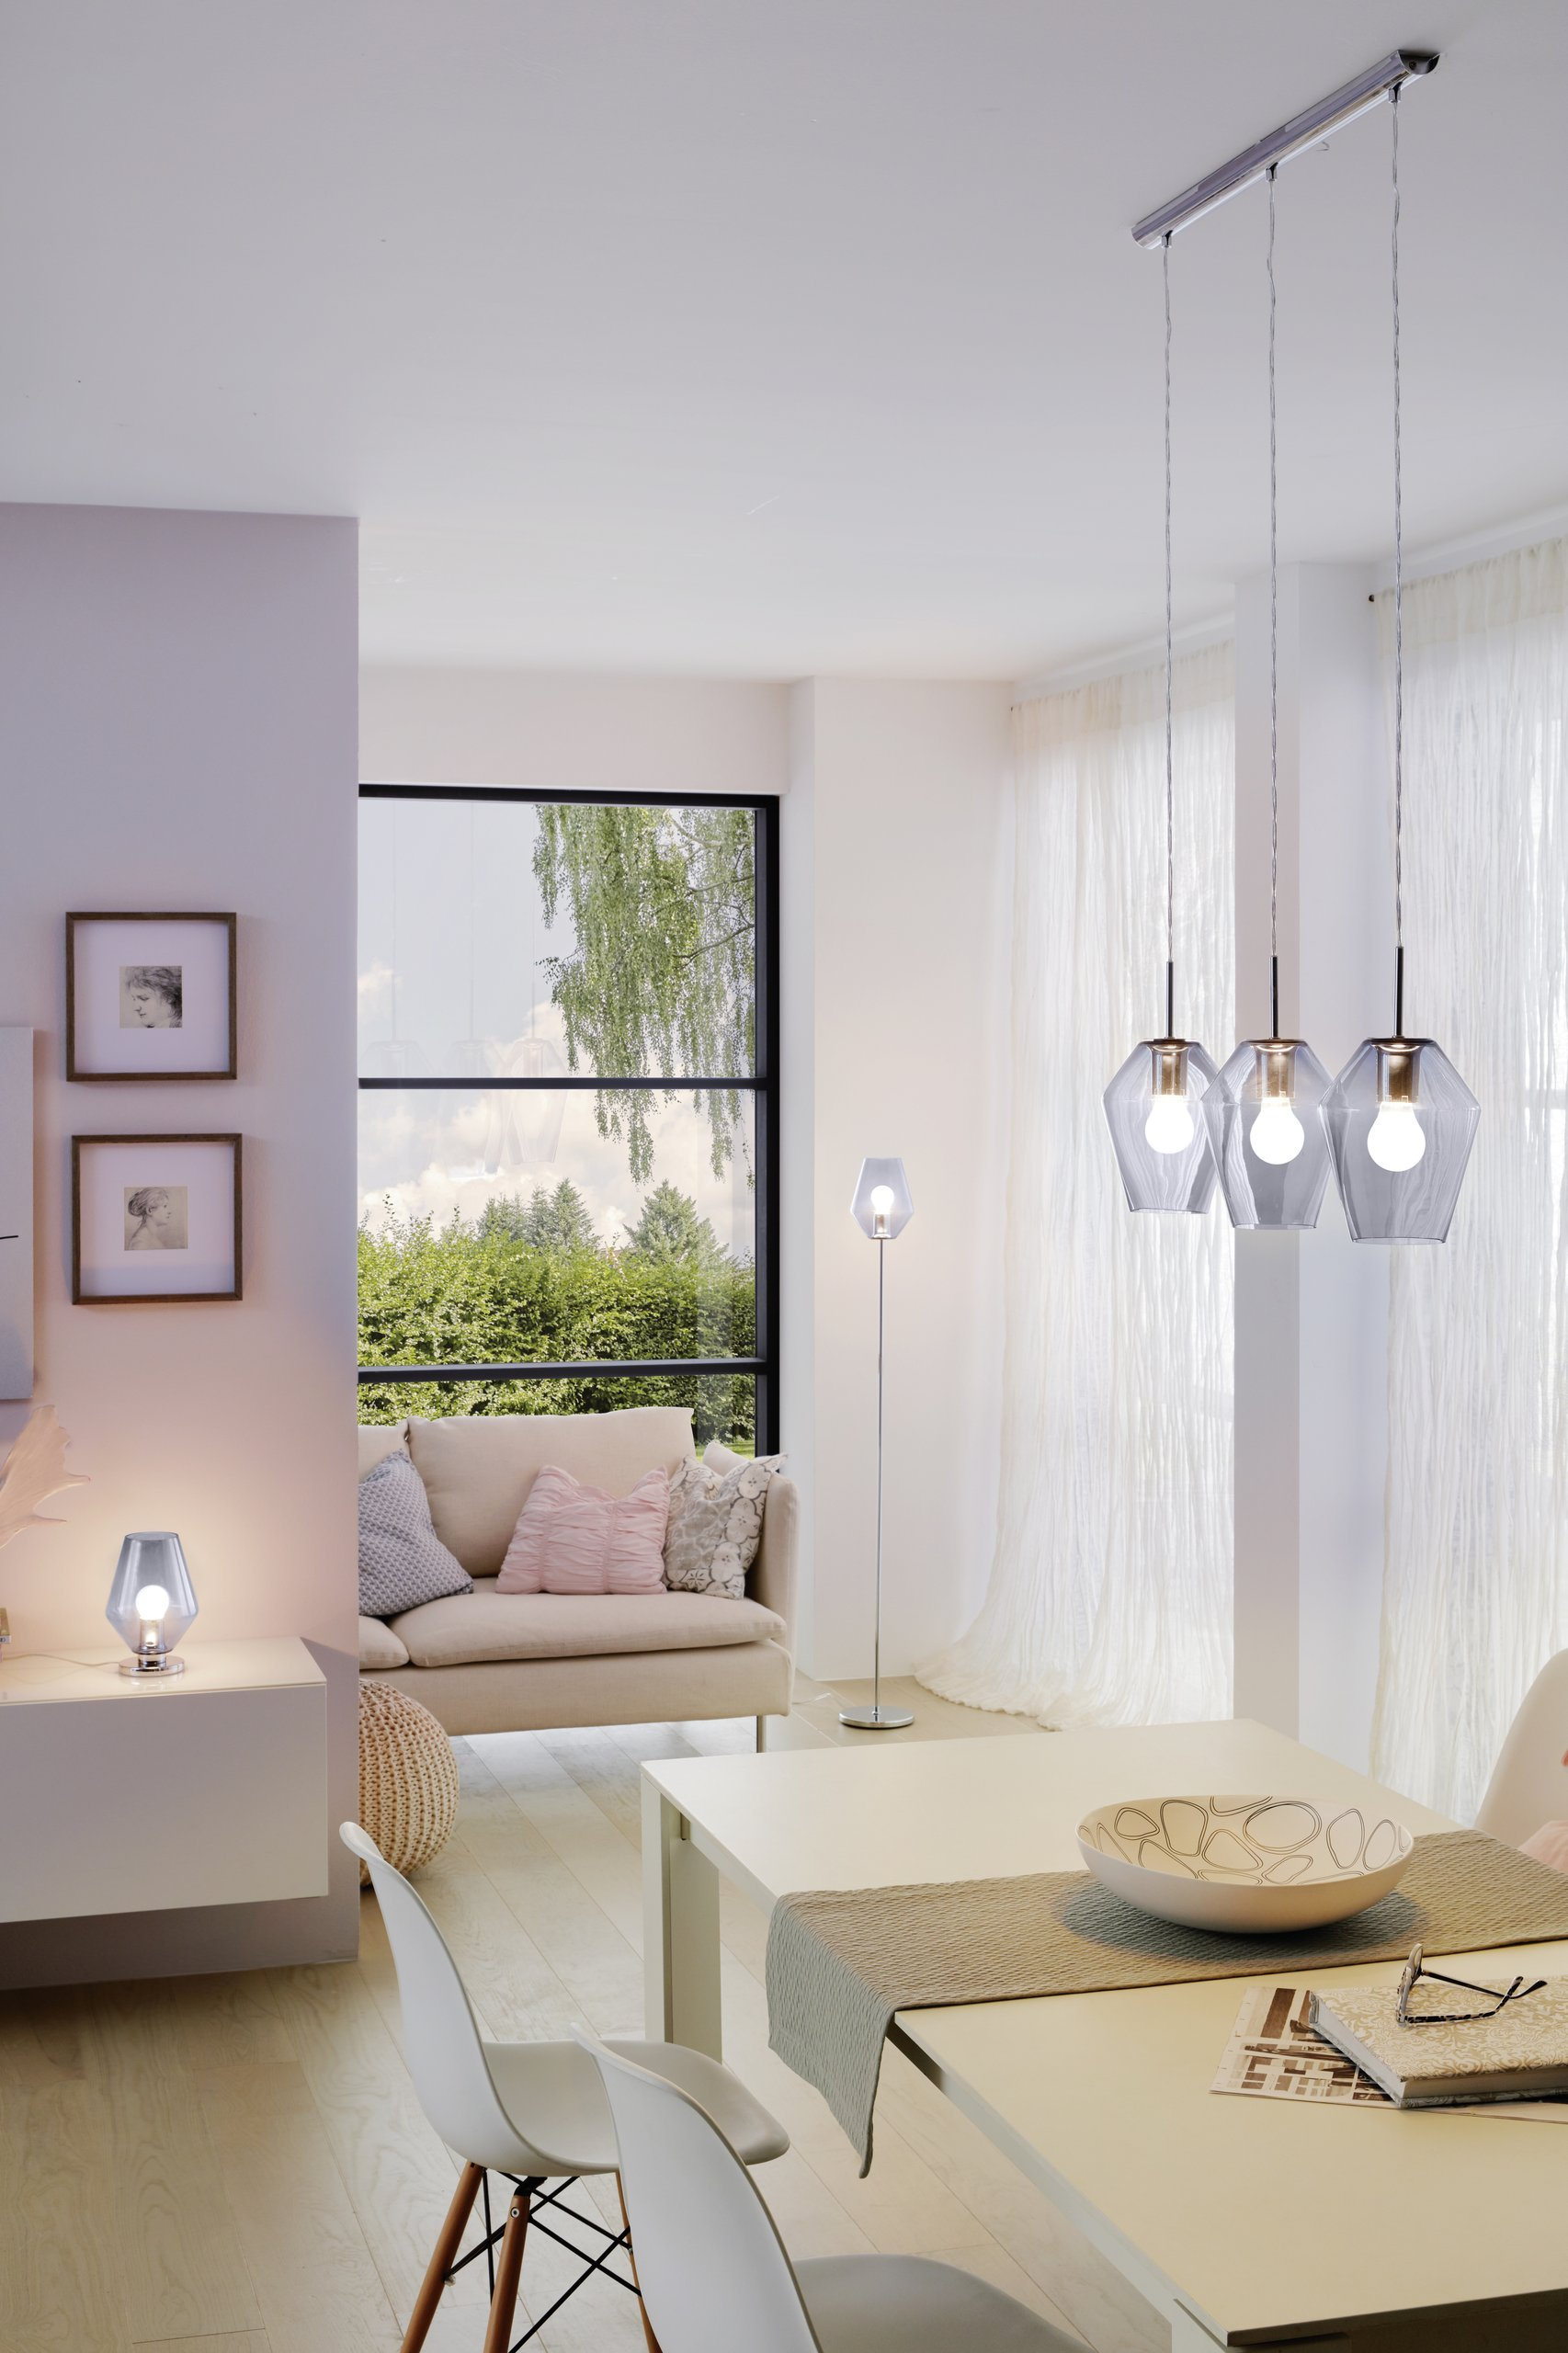 EGLO 96775 MURMILLO stolní lampa